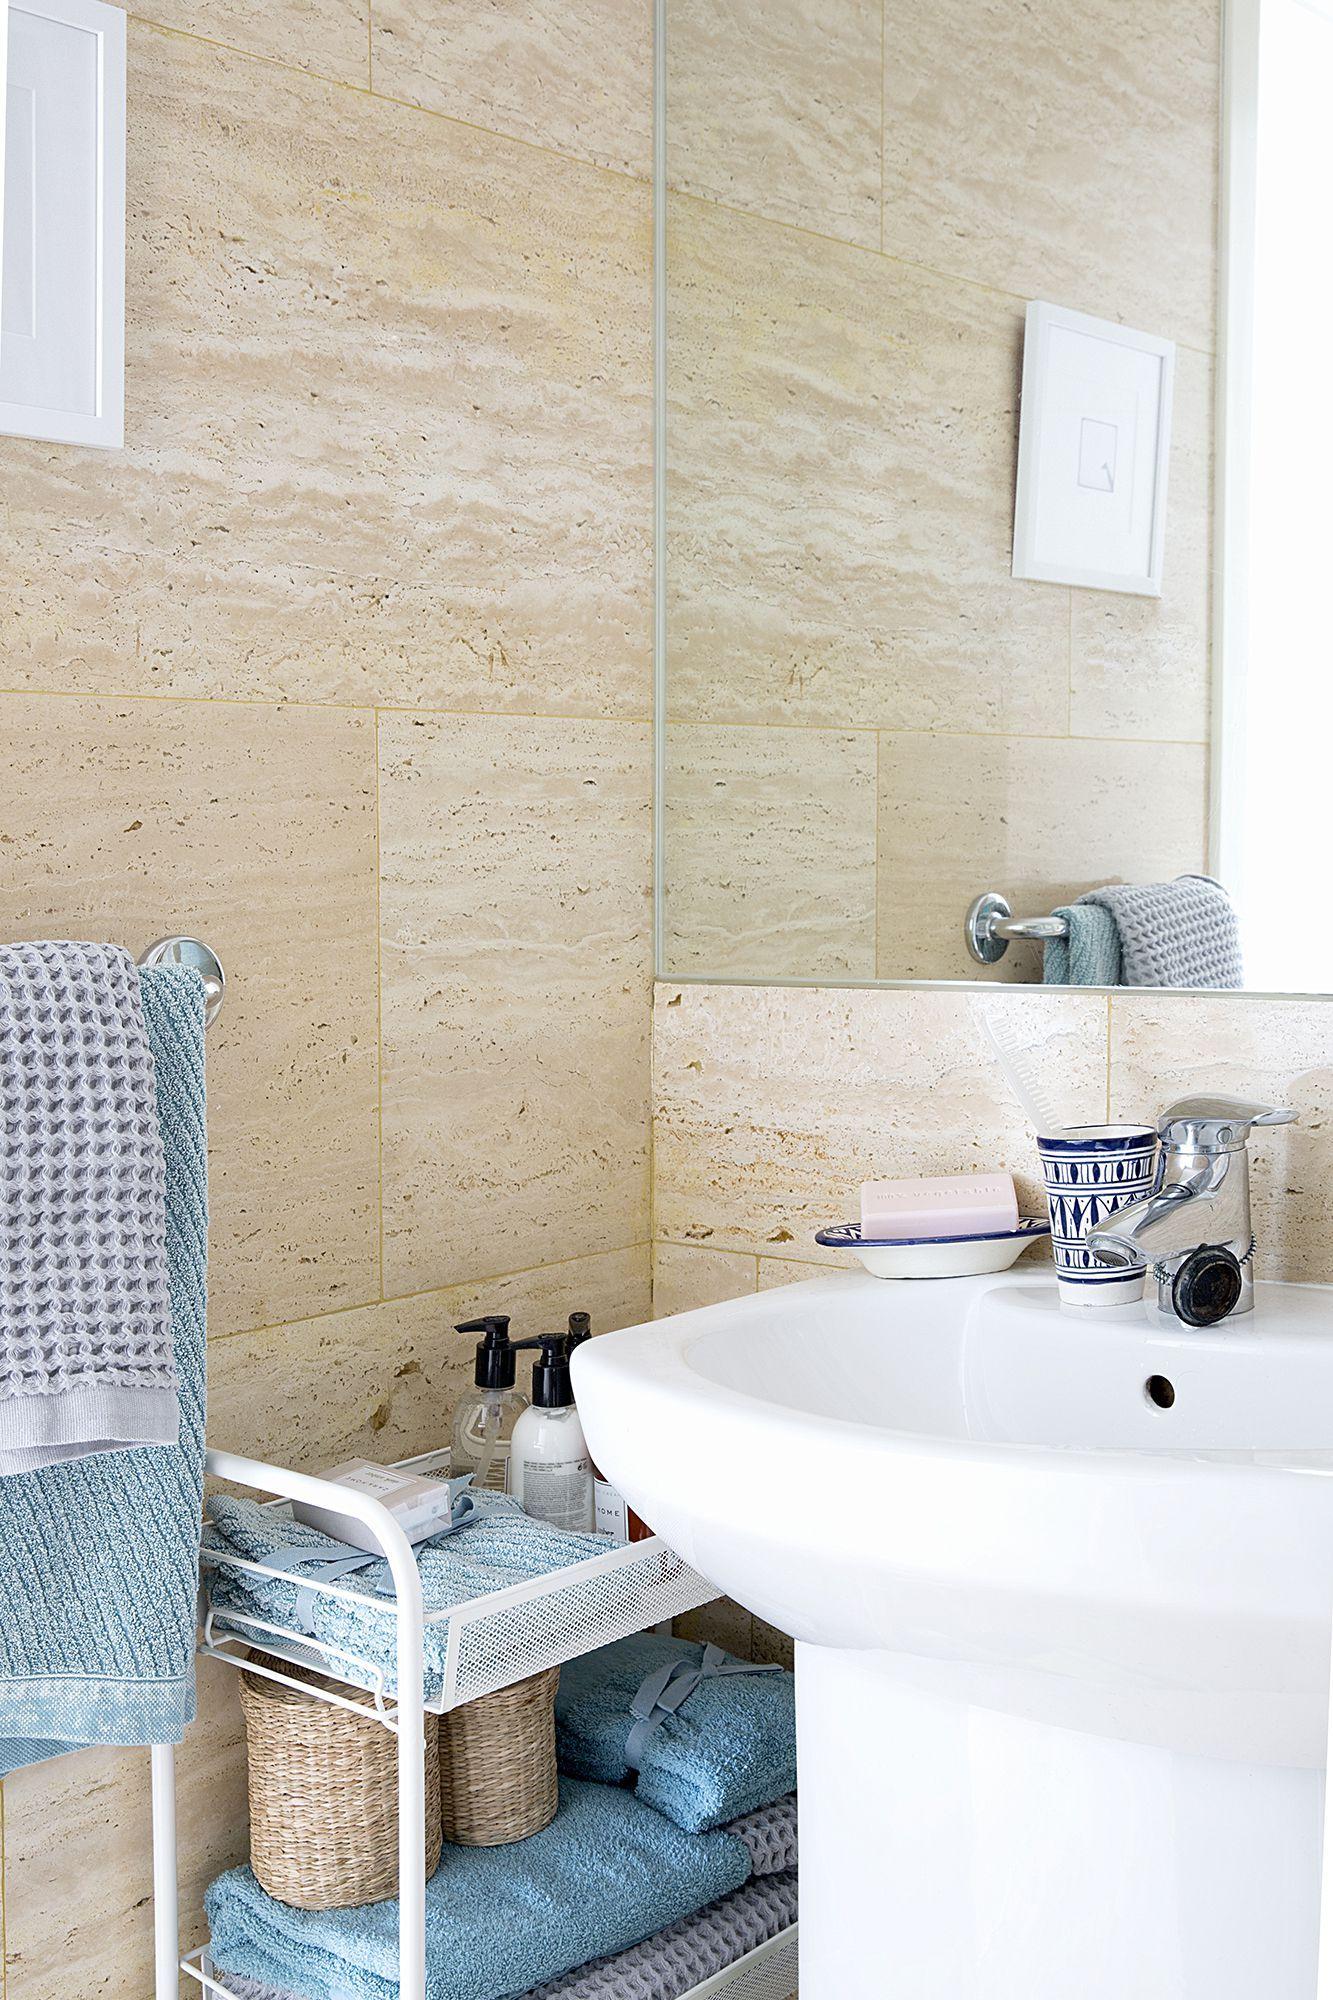 Mármol perfecto | Limpiar baños, Baño marmol, Limpiar